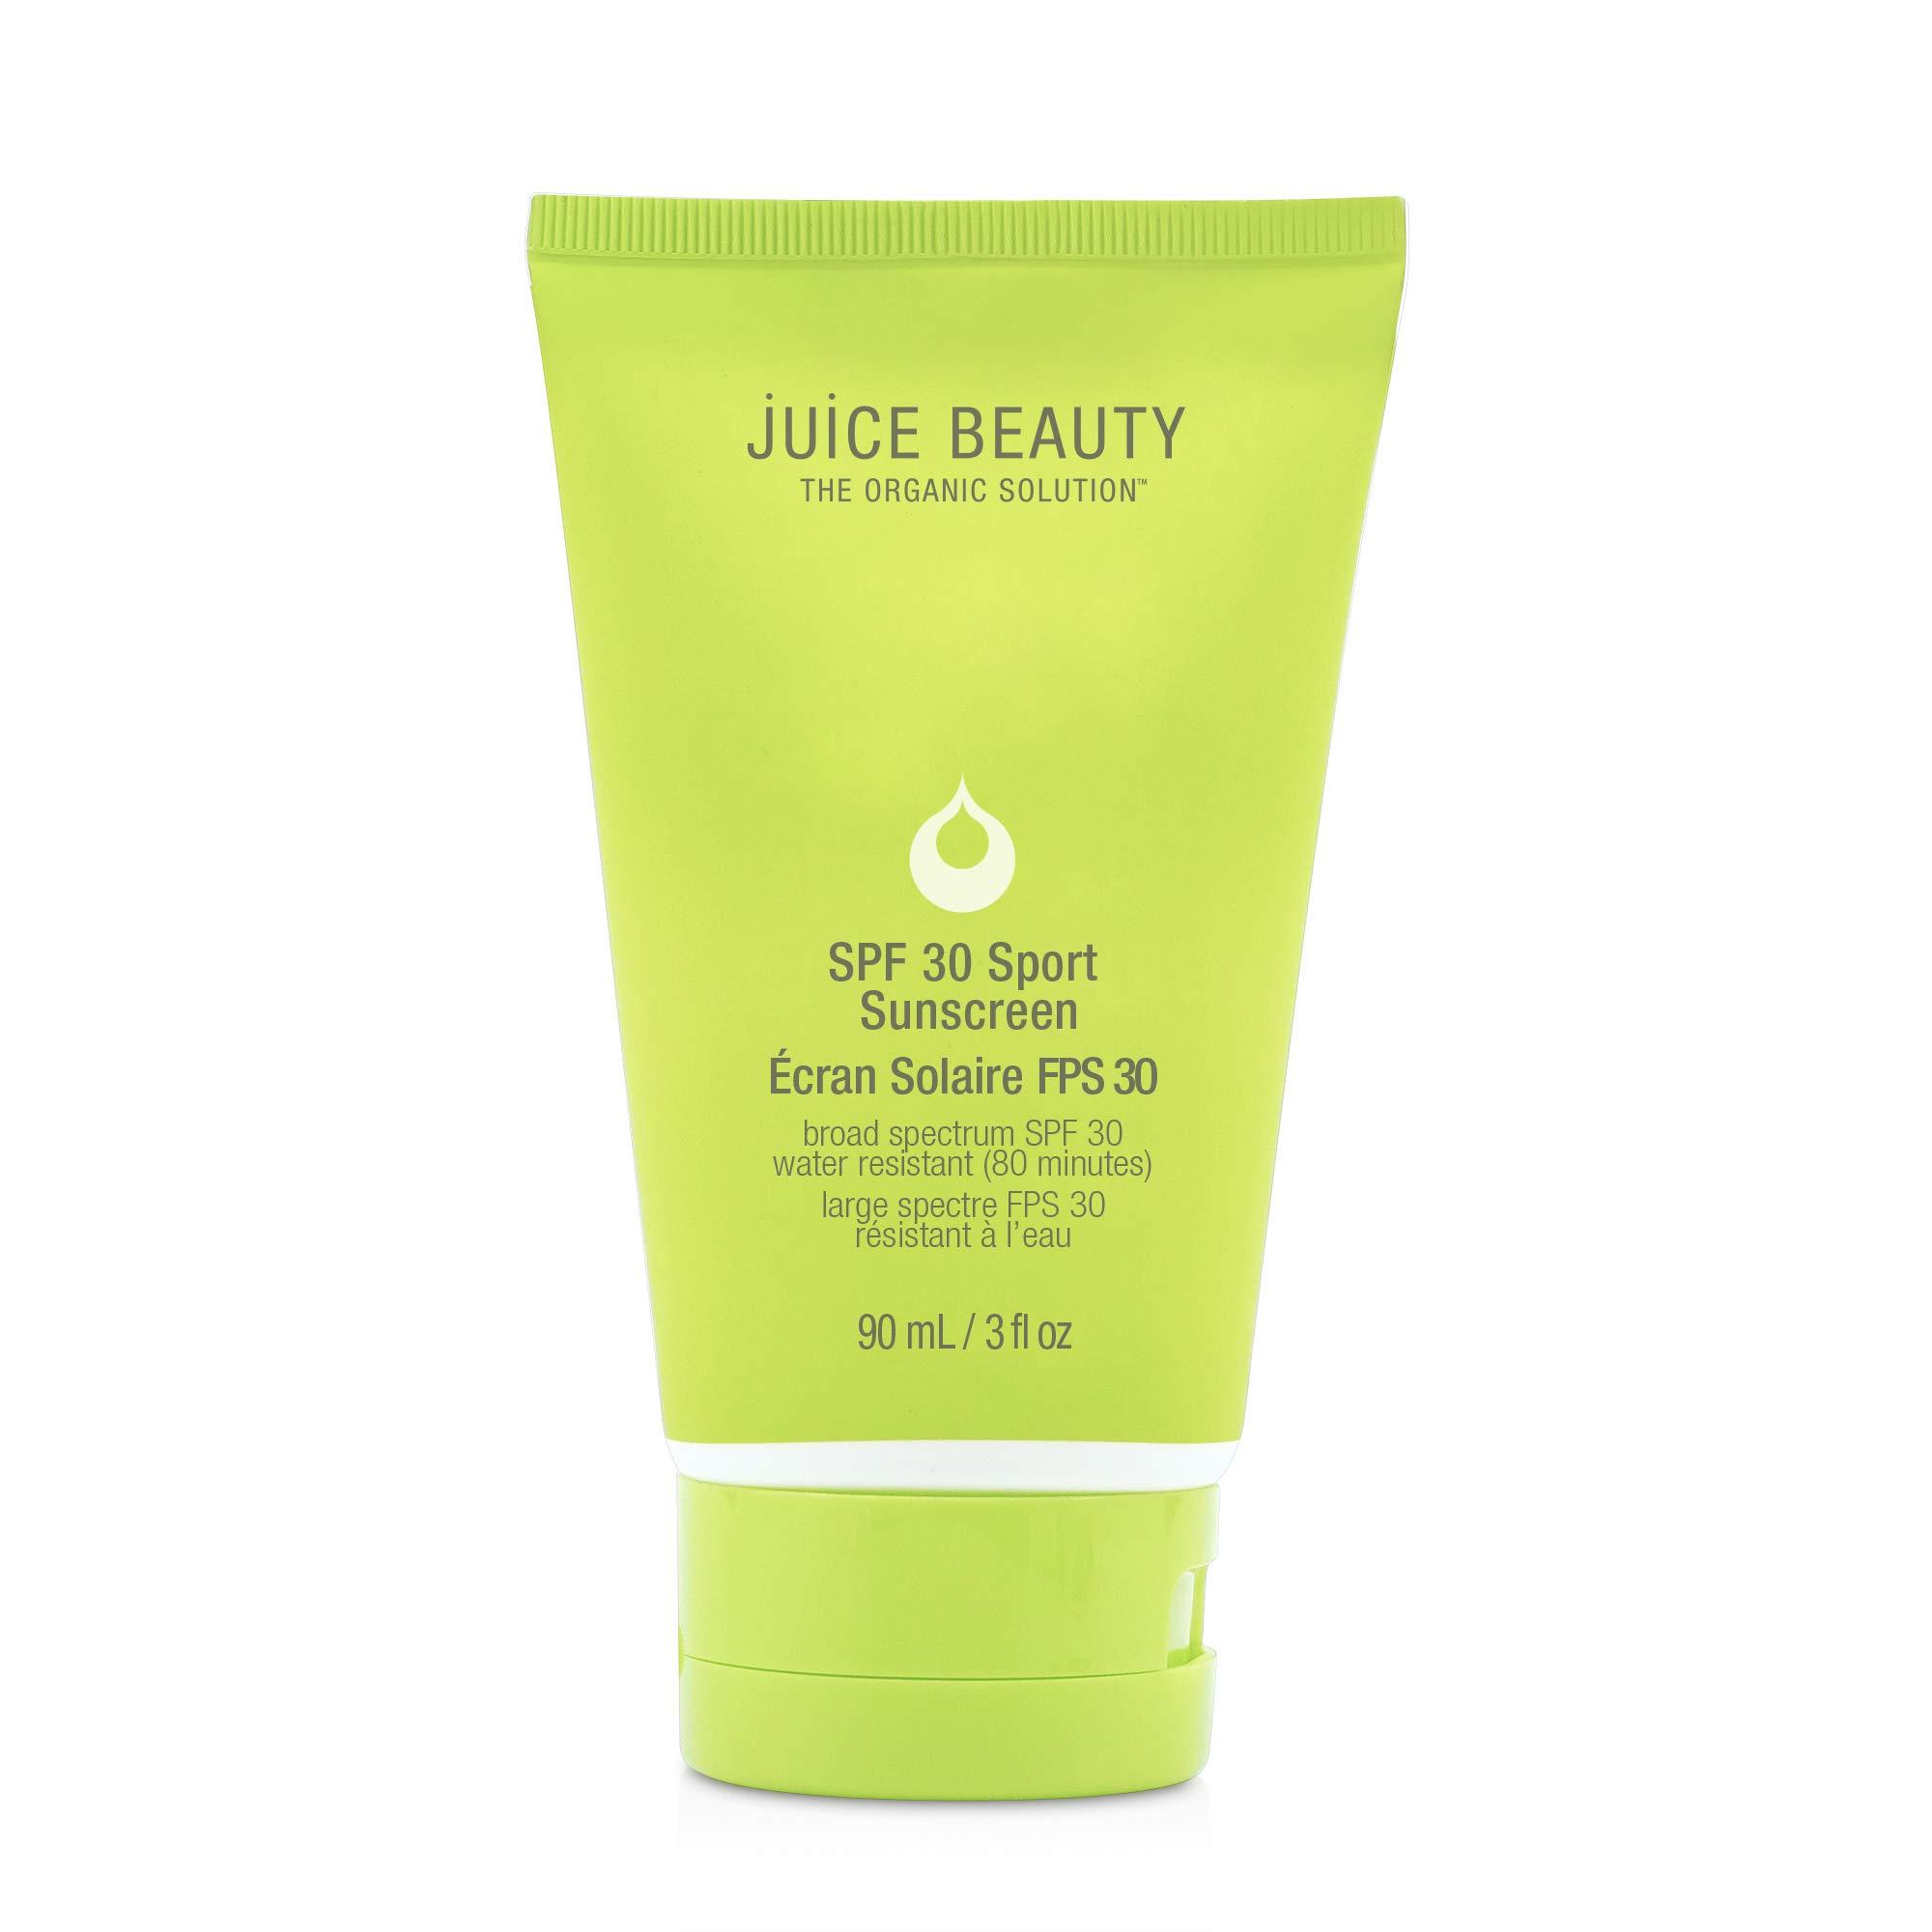 Juice Beauty SPF Sport Sunscreen